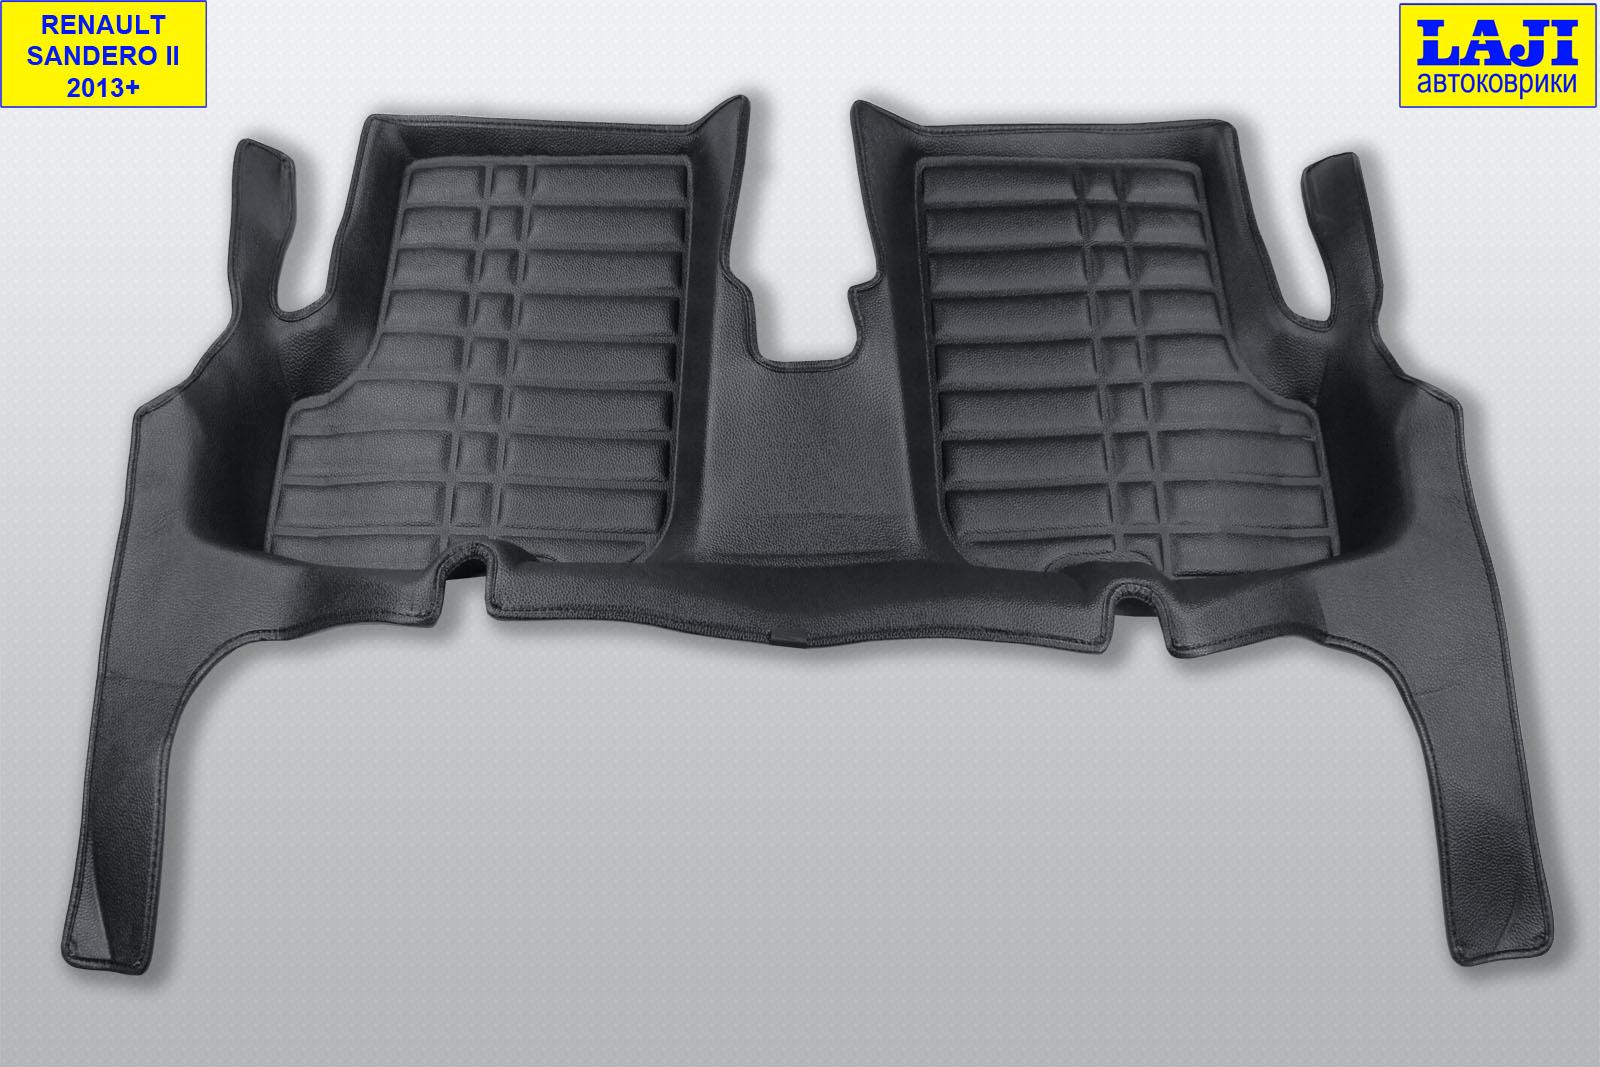 5D коврики в салон Renault Sandero Stepway 2 2014-н.в. 9